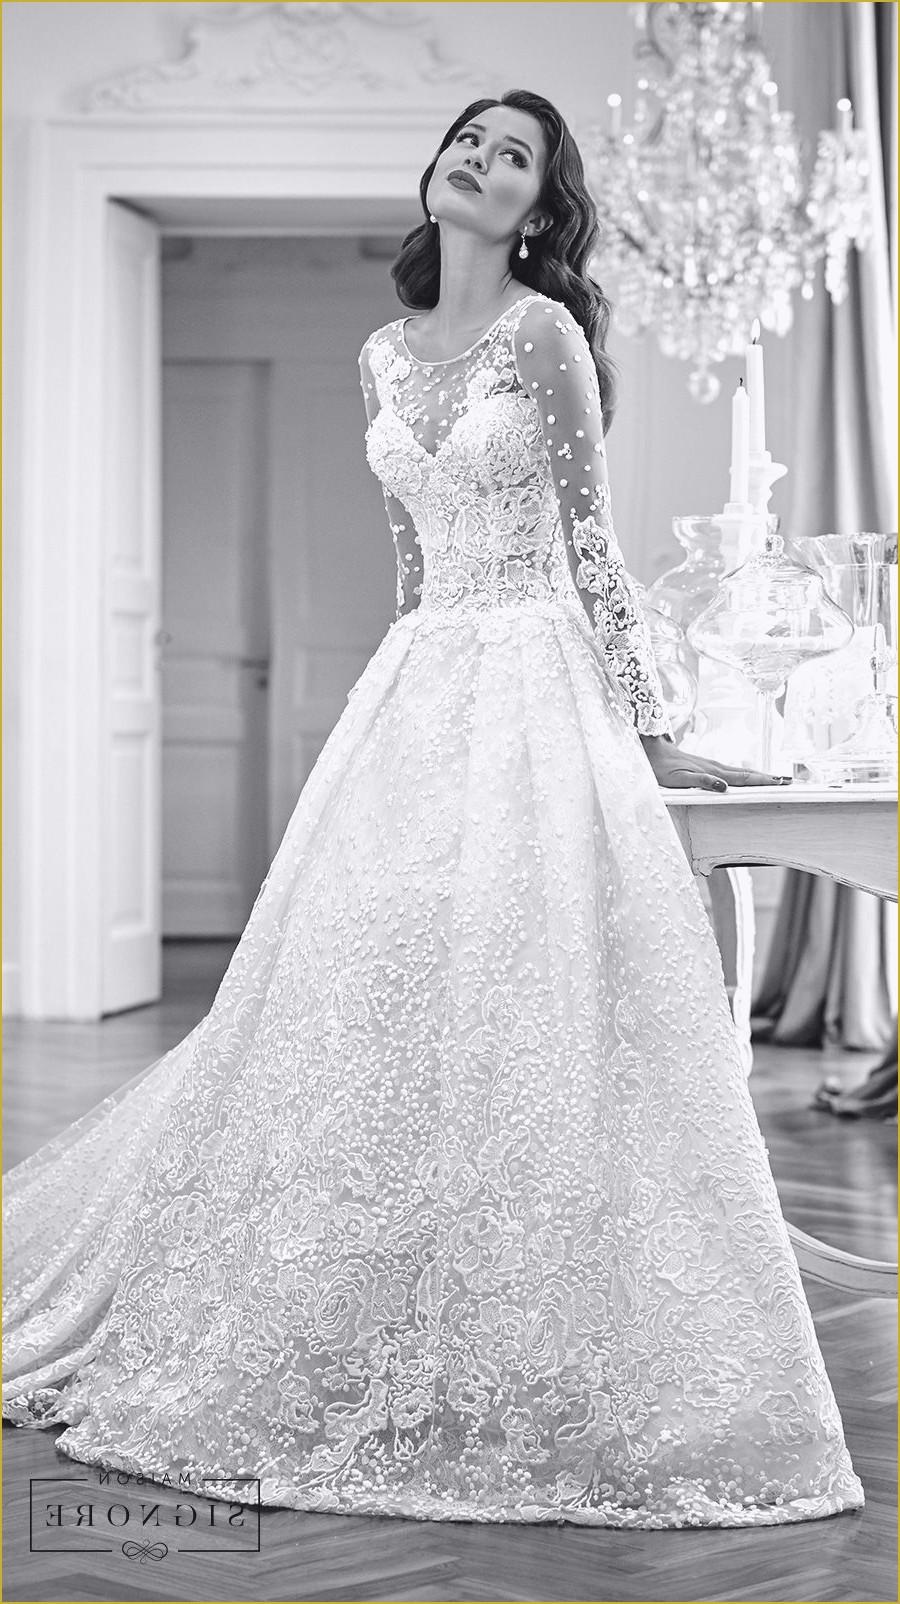 Japanese Wedding Gowns Awesome Fabulous Japanese Wedding Dresses Wedding Dresses Ball Gowns Wedding White Lace Wedding Dress